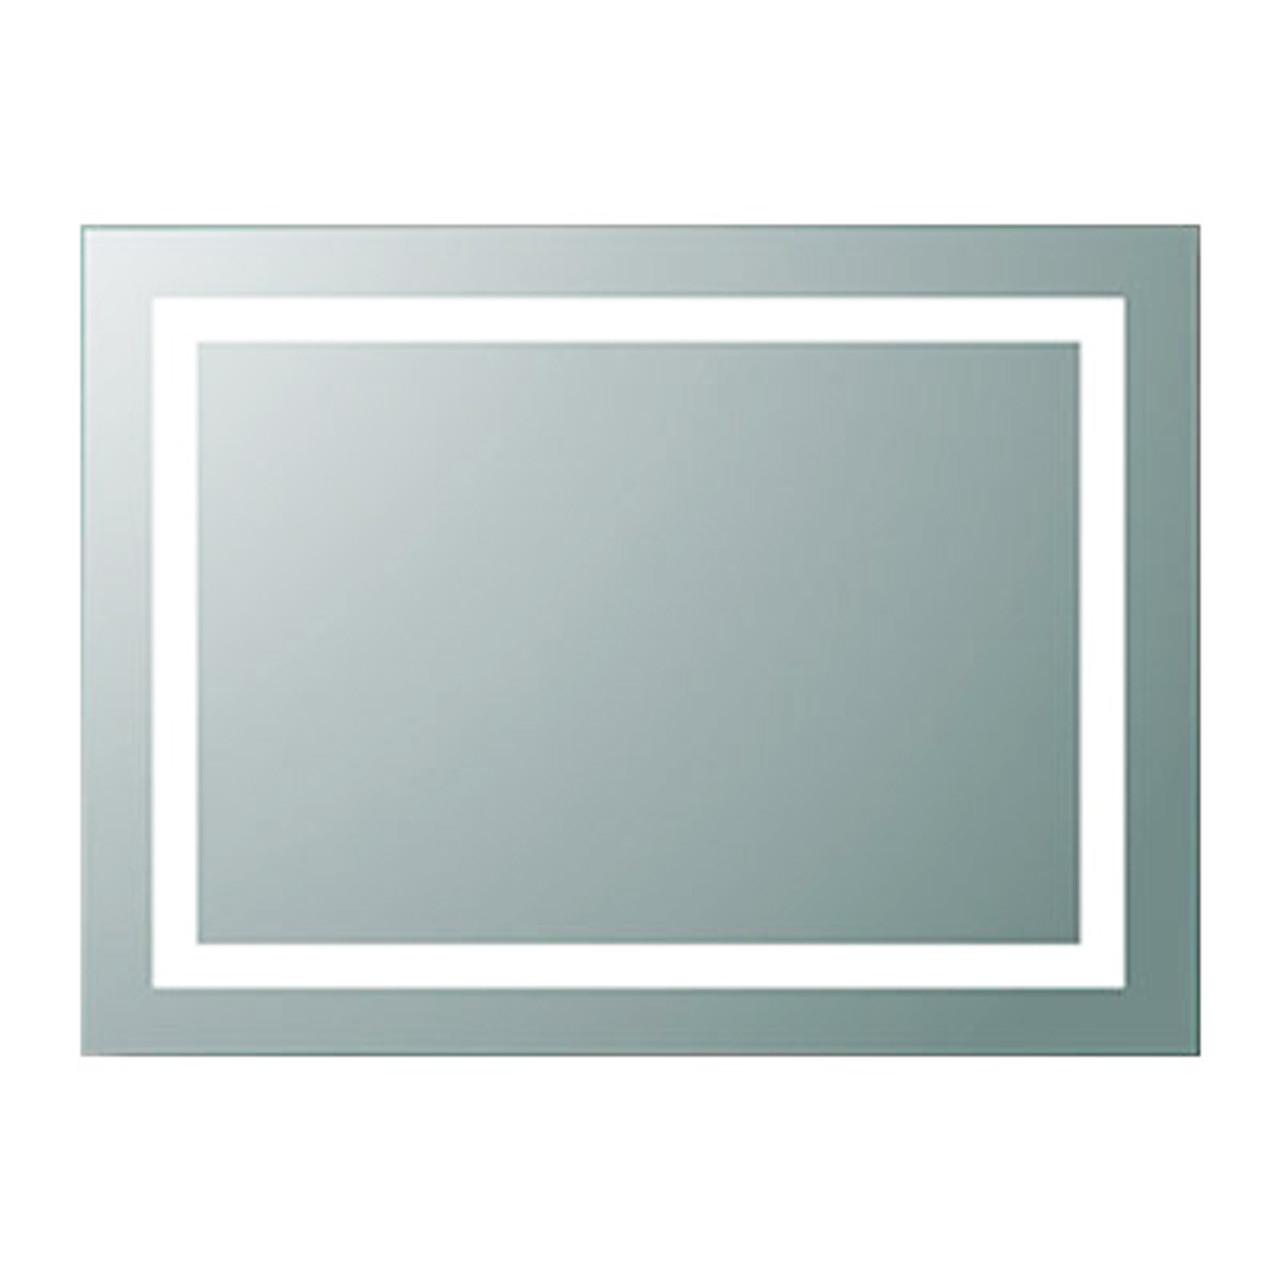 LED Backlit Mirror Light 36x48in. – 80W